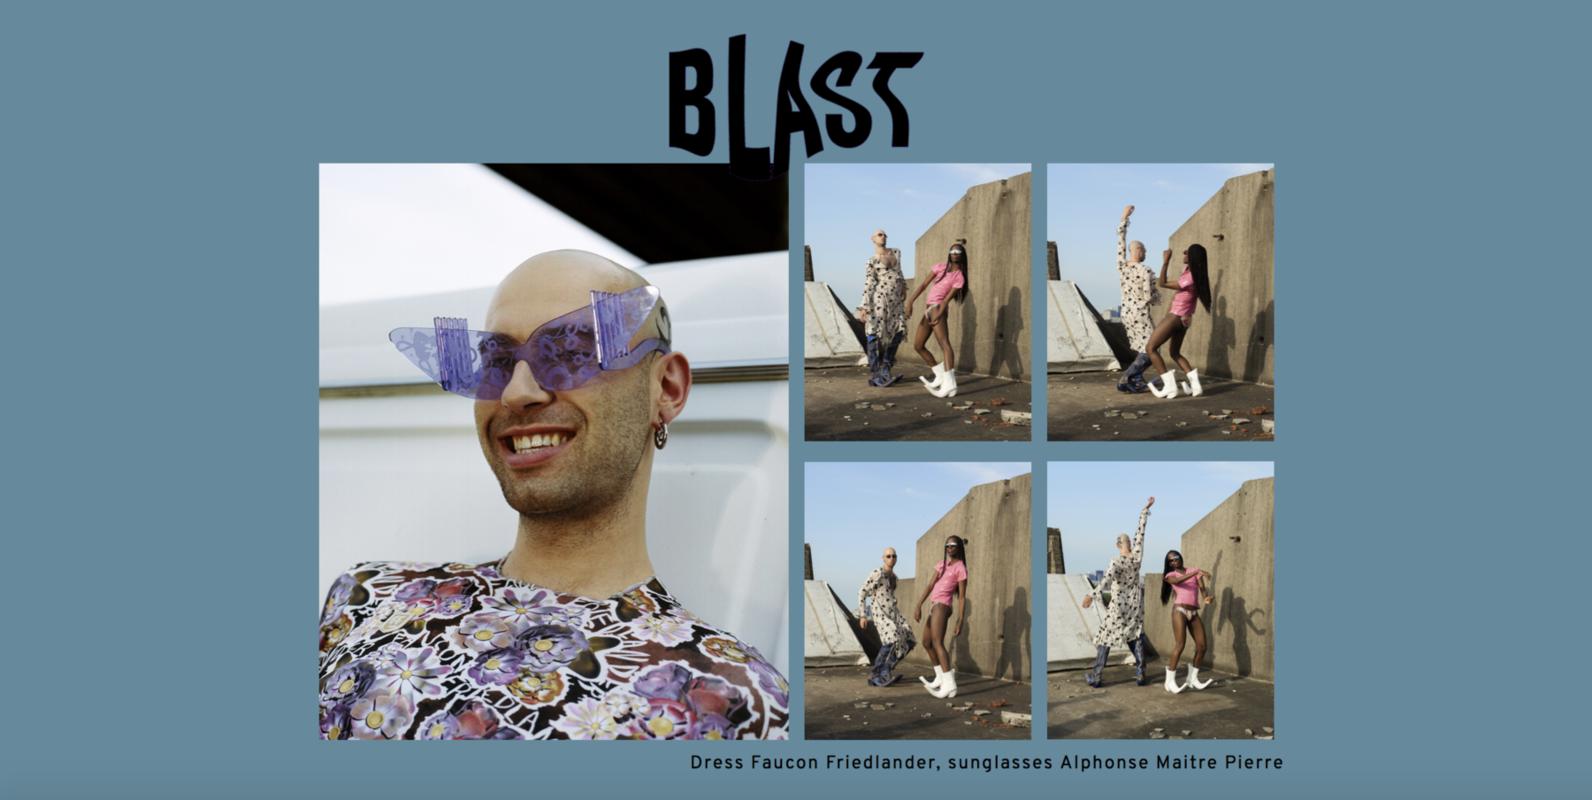 ALPHONSE-MAITREPIERRE - BLAST MAG